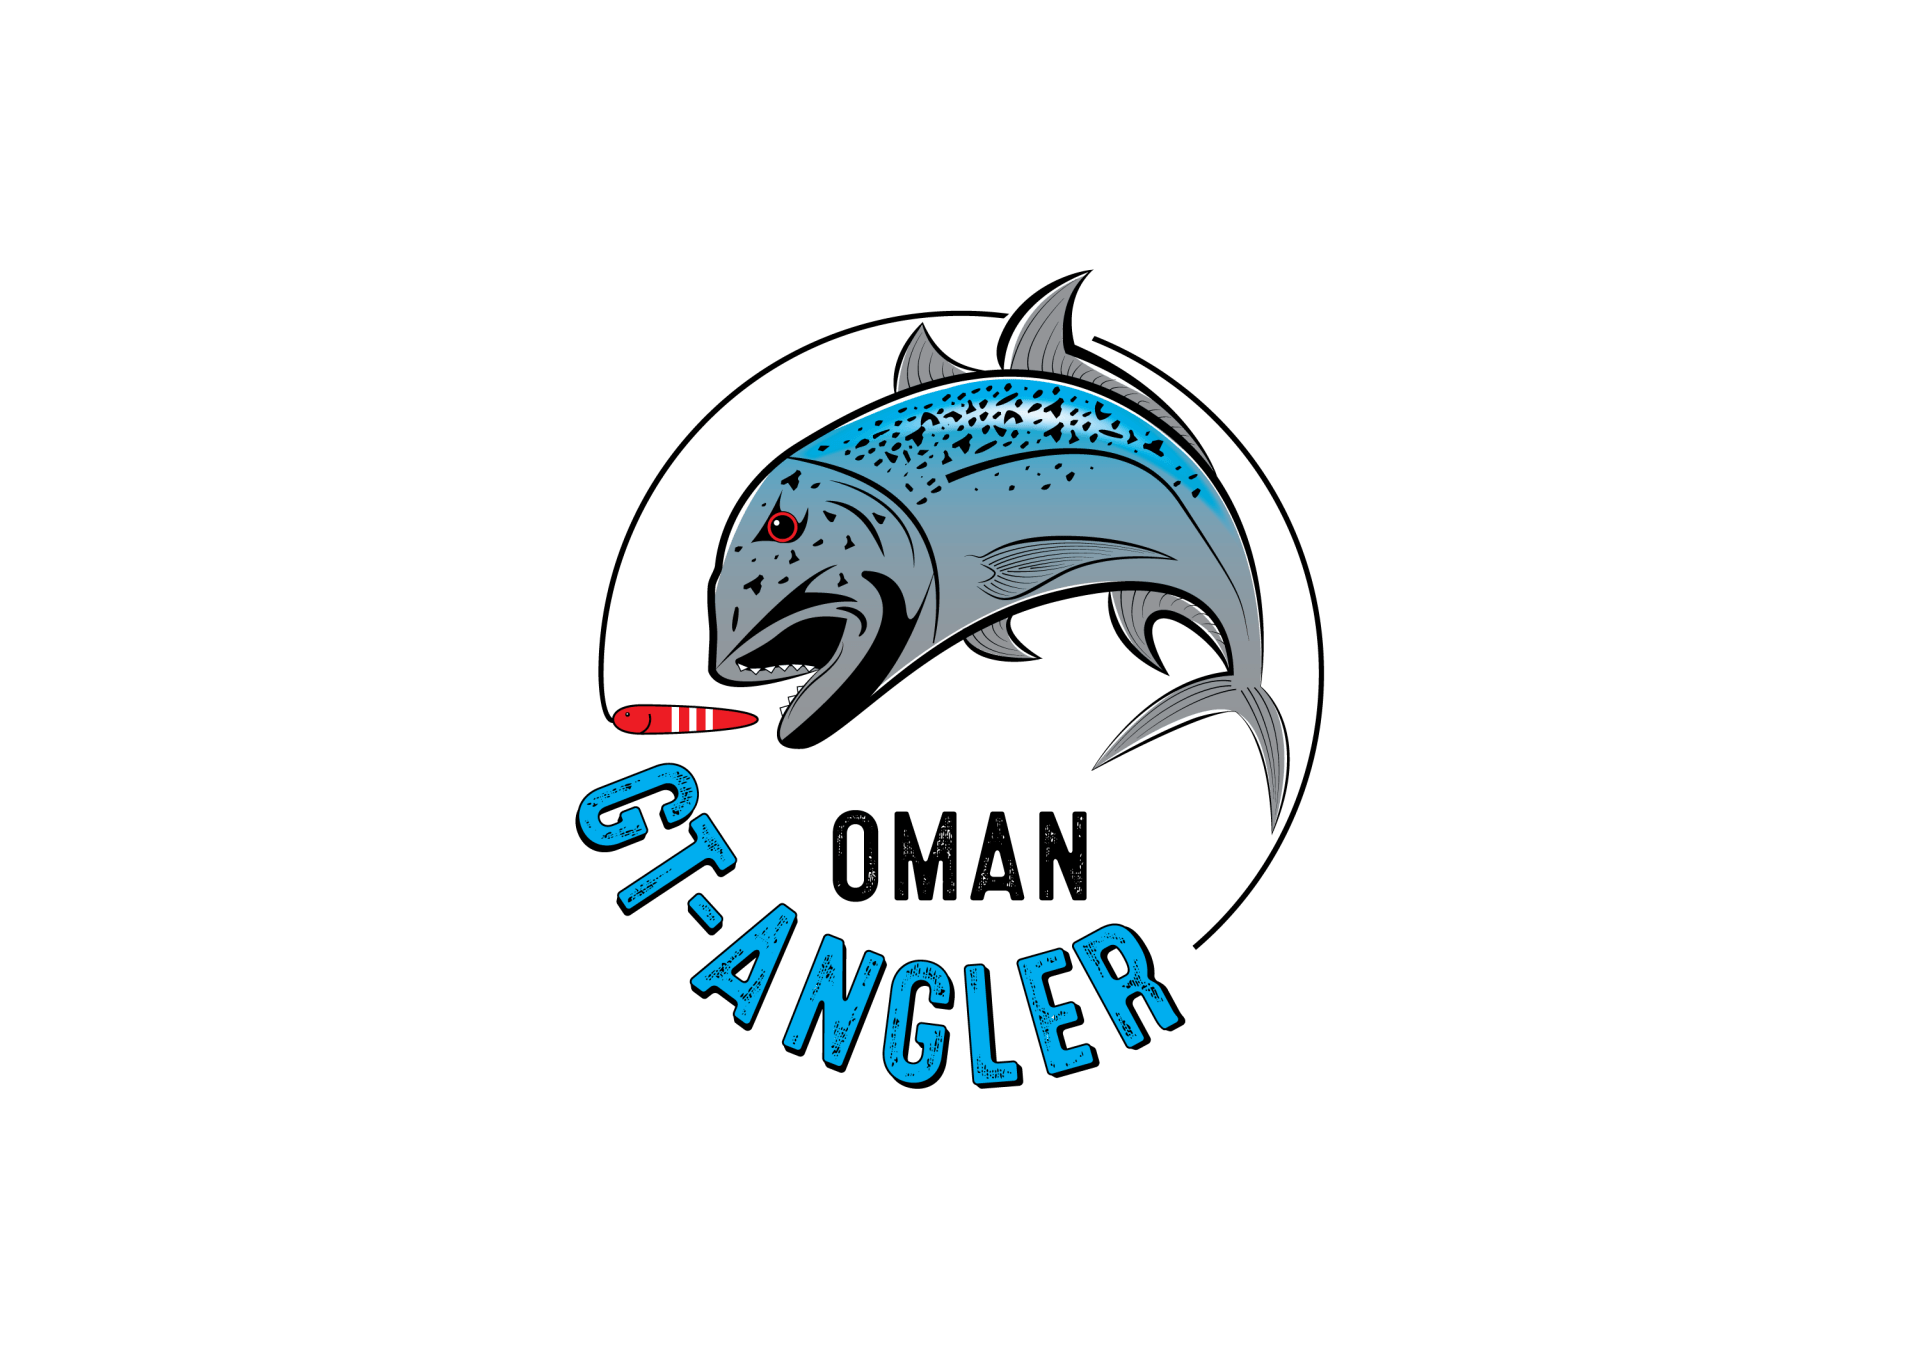 GT-Angler-Oman,GT,fishing,oman,popping, Jigging